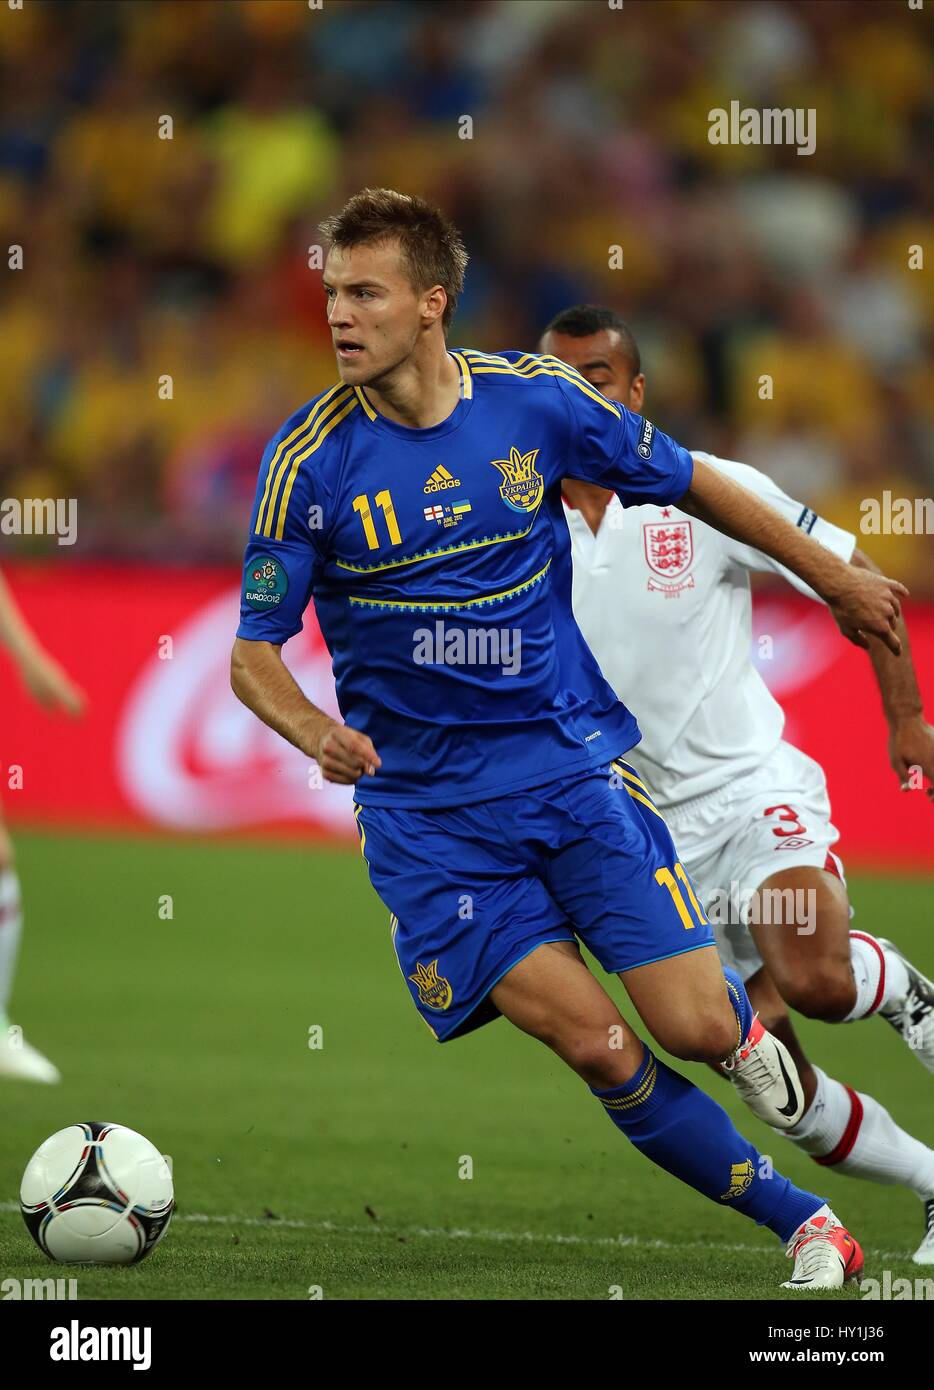 ANDRIY YARMOLENKO UKRAINE DYNAMO KYIV FC UKRAINE & DYNAMO KYIV FC